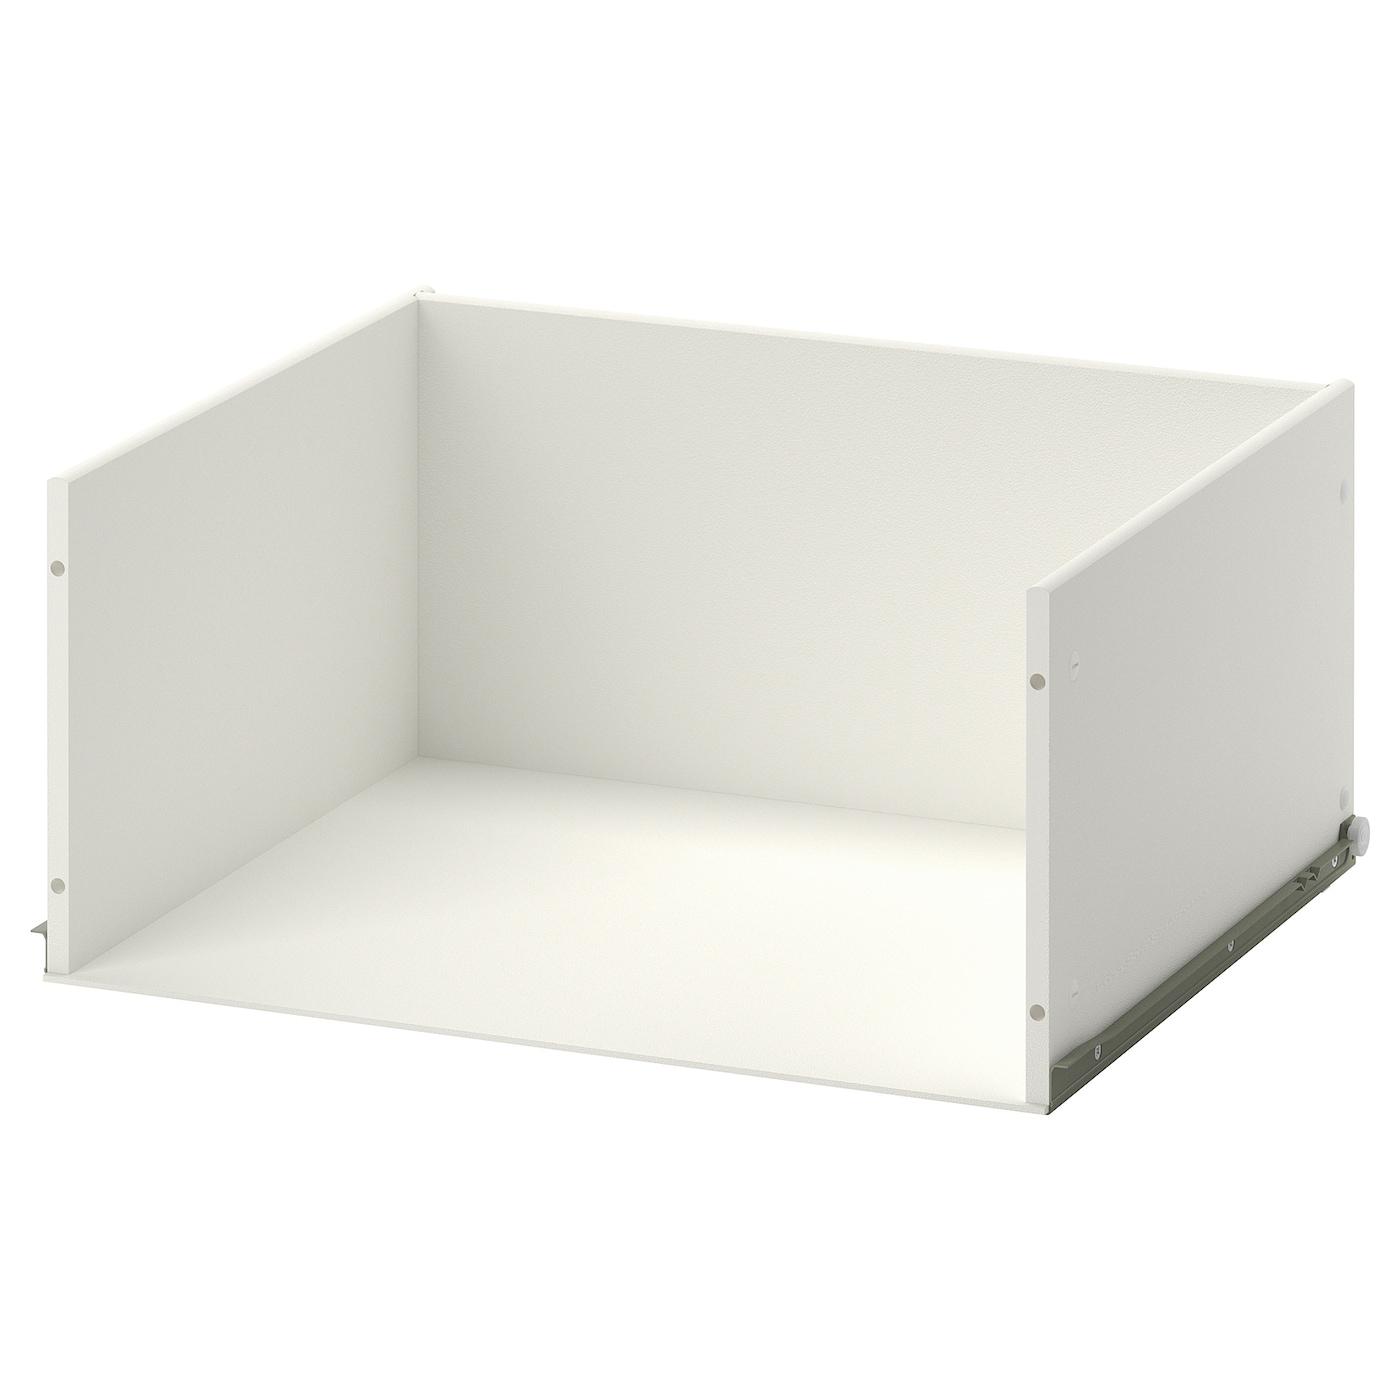 free try out of usm tv lowboard from usm haller in 3d vr and ar. Black Bedroom Furniture Sets. Home Design Ideas